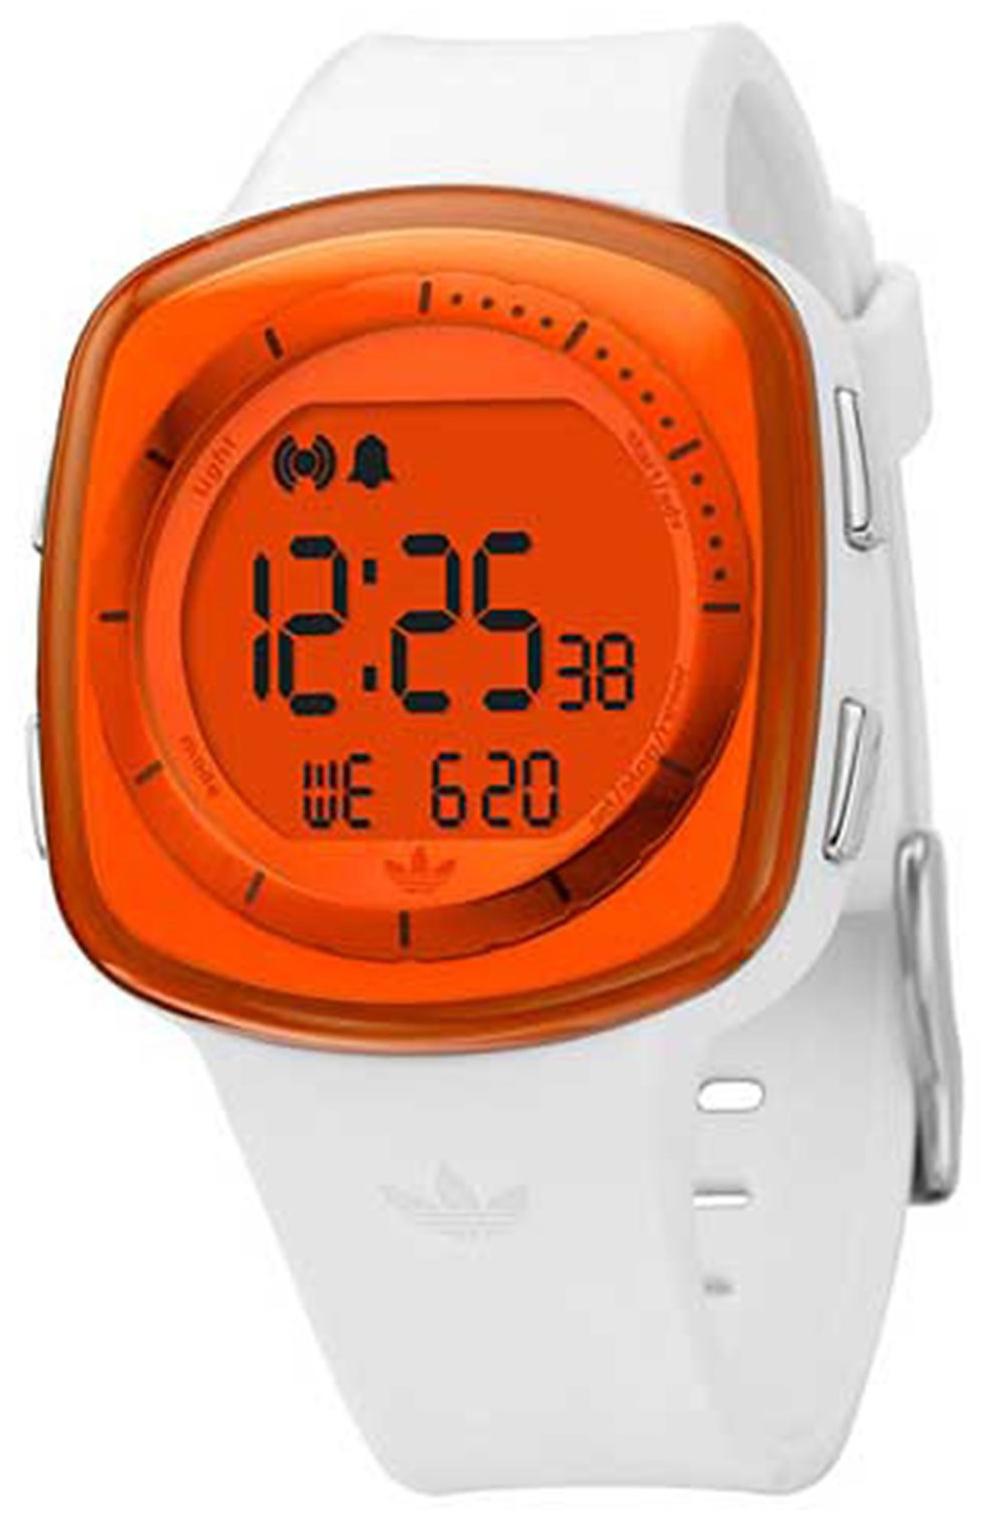 Adidas Tokyo ADH6045 LCD/Gummi - Adidas